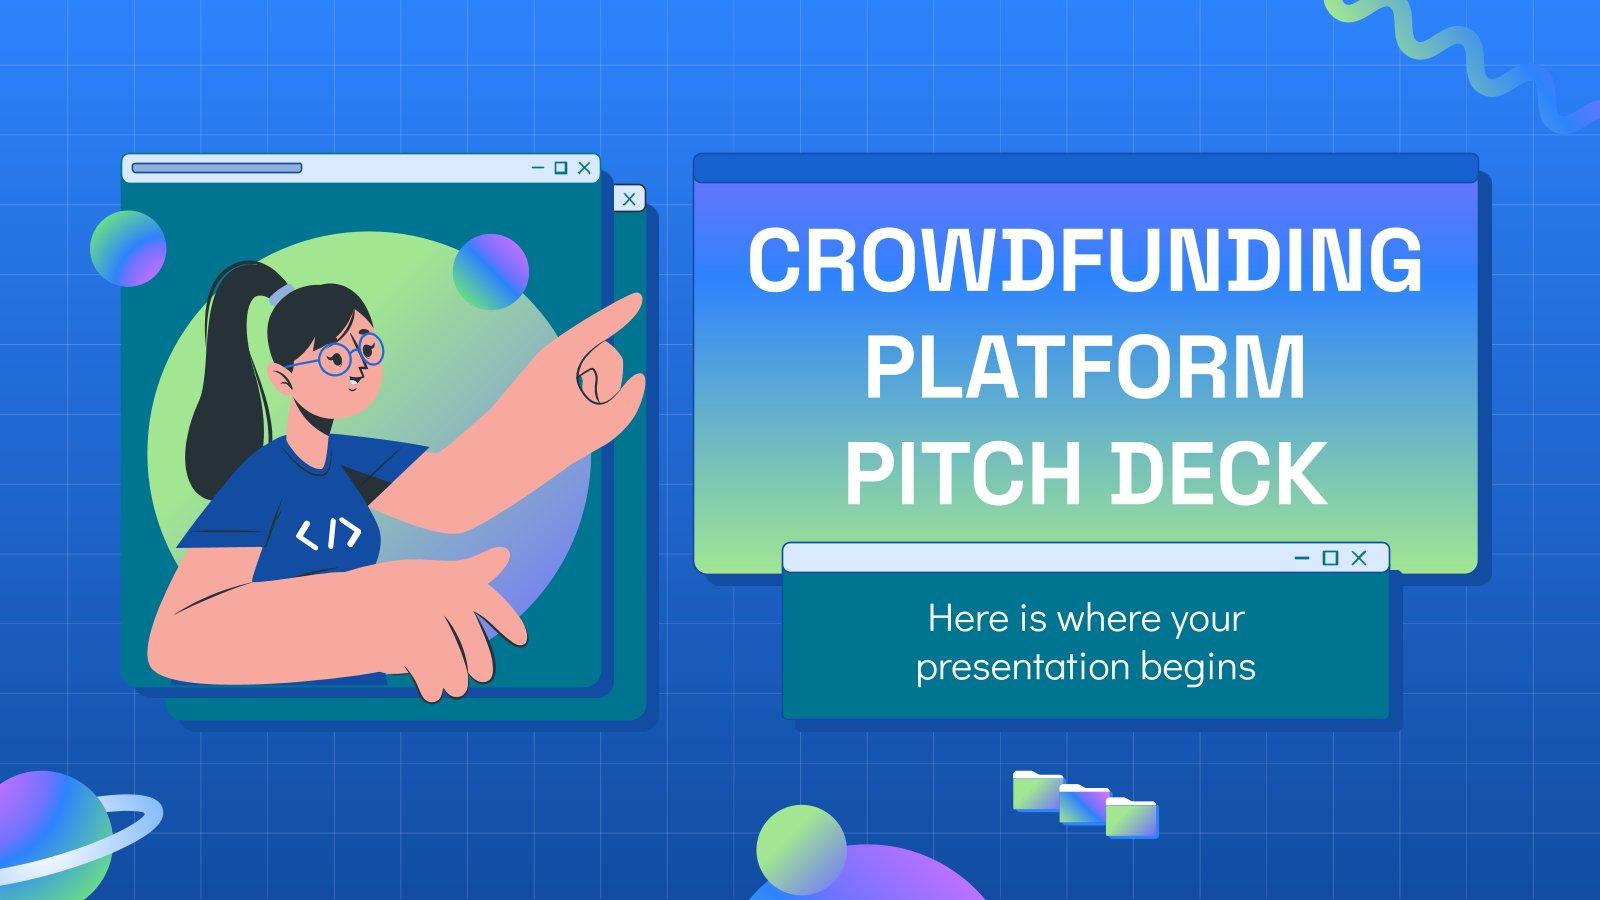 Crowdfunding Platform Pitch Deck presentation template